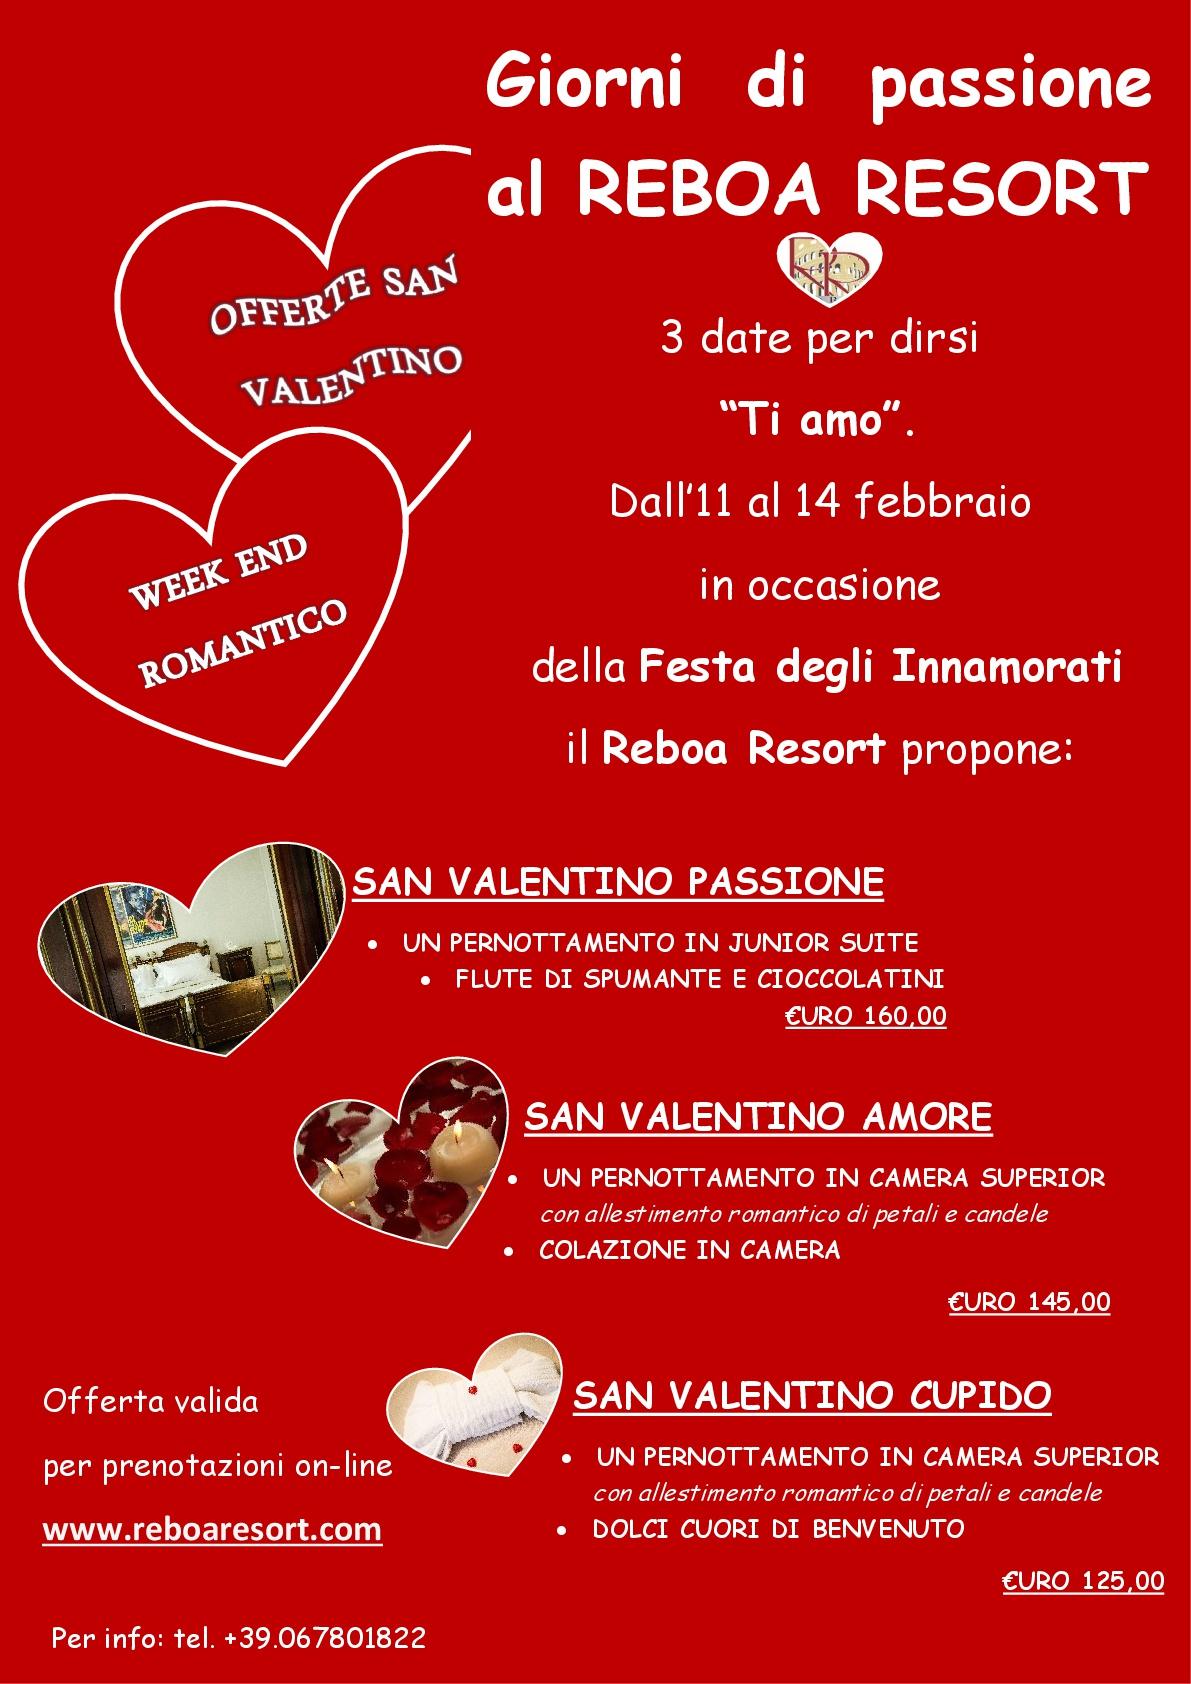 Volantino-San-Valentino-001.jpg